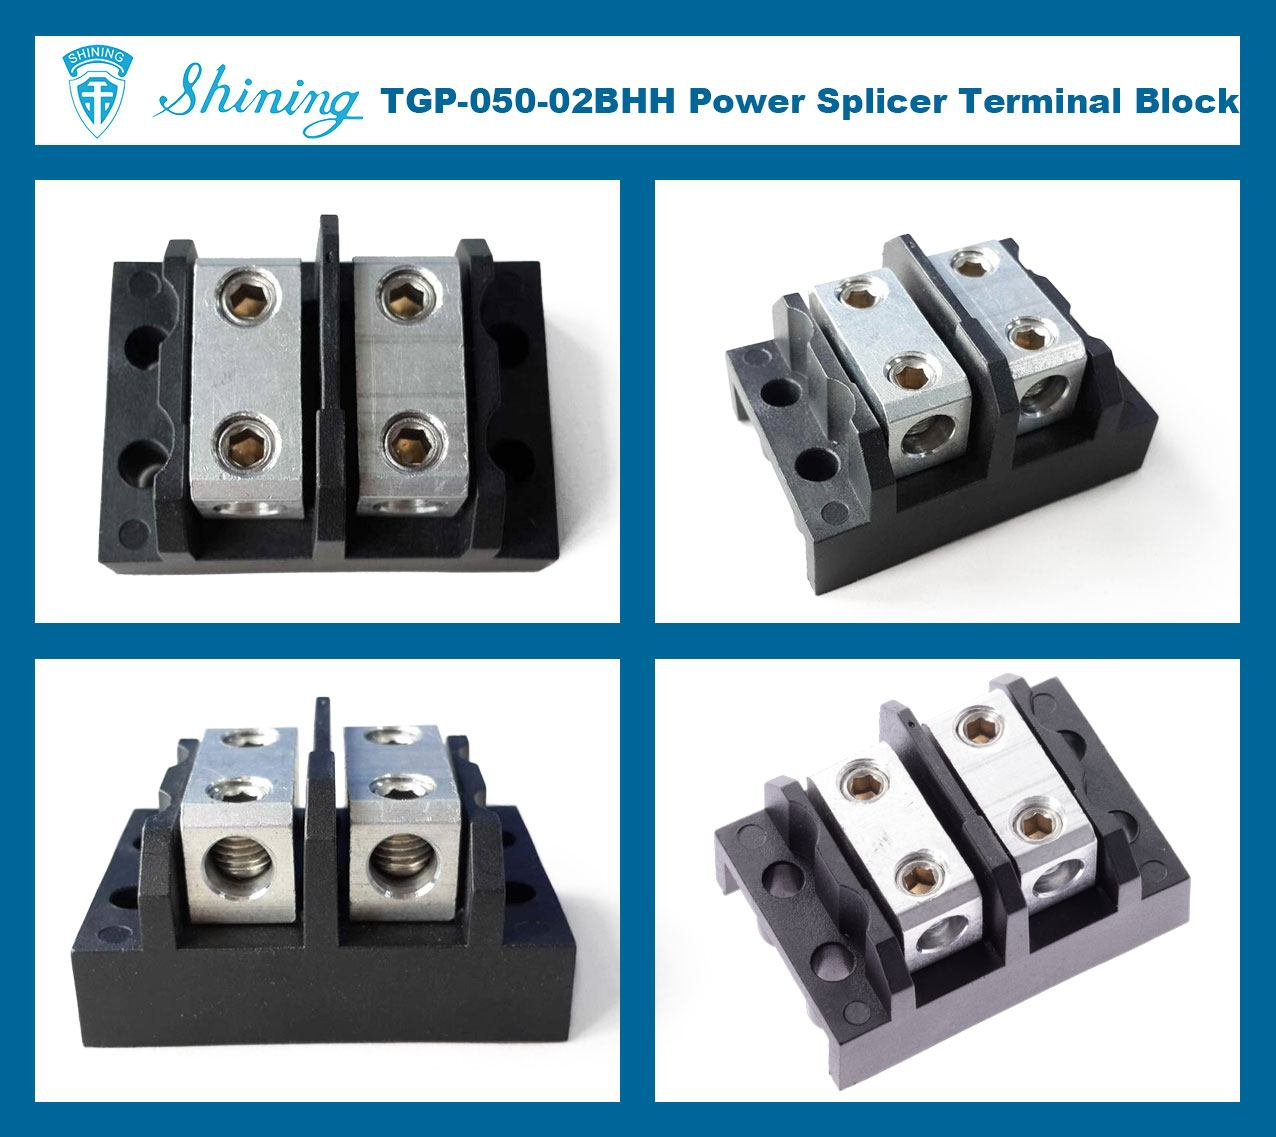 TGP-050-02BHH 600V 50A 2 Way Power Splicer Terminal Block